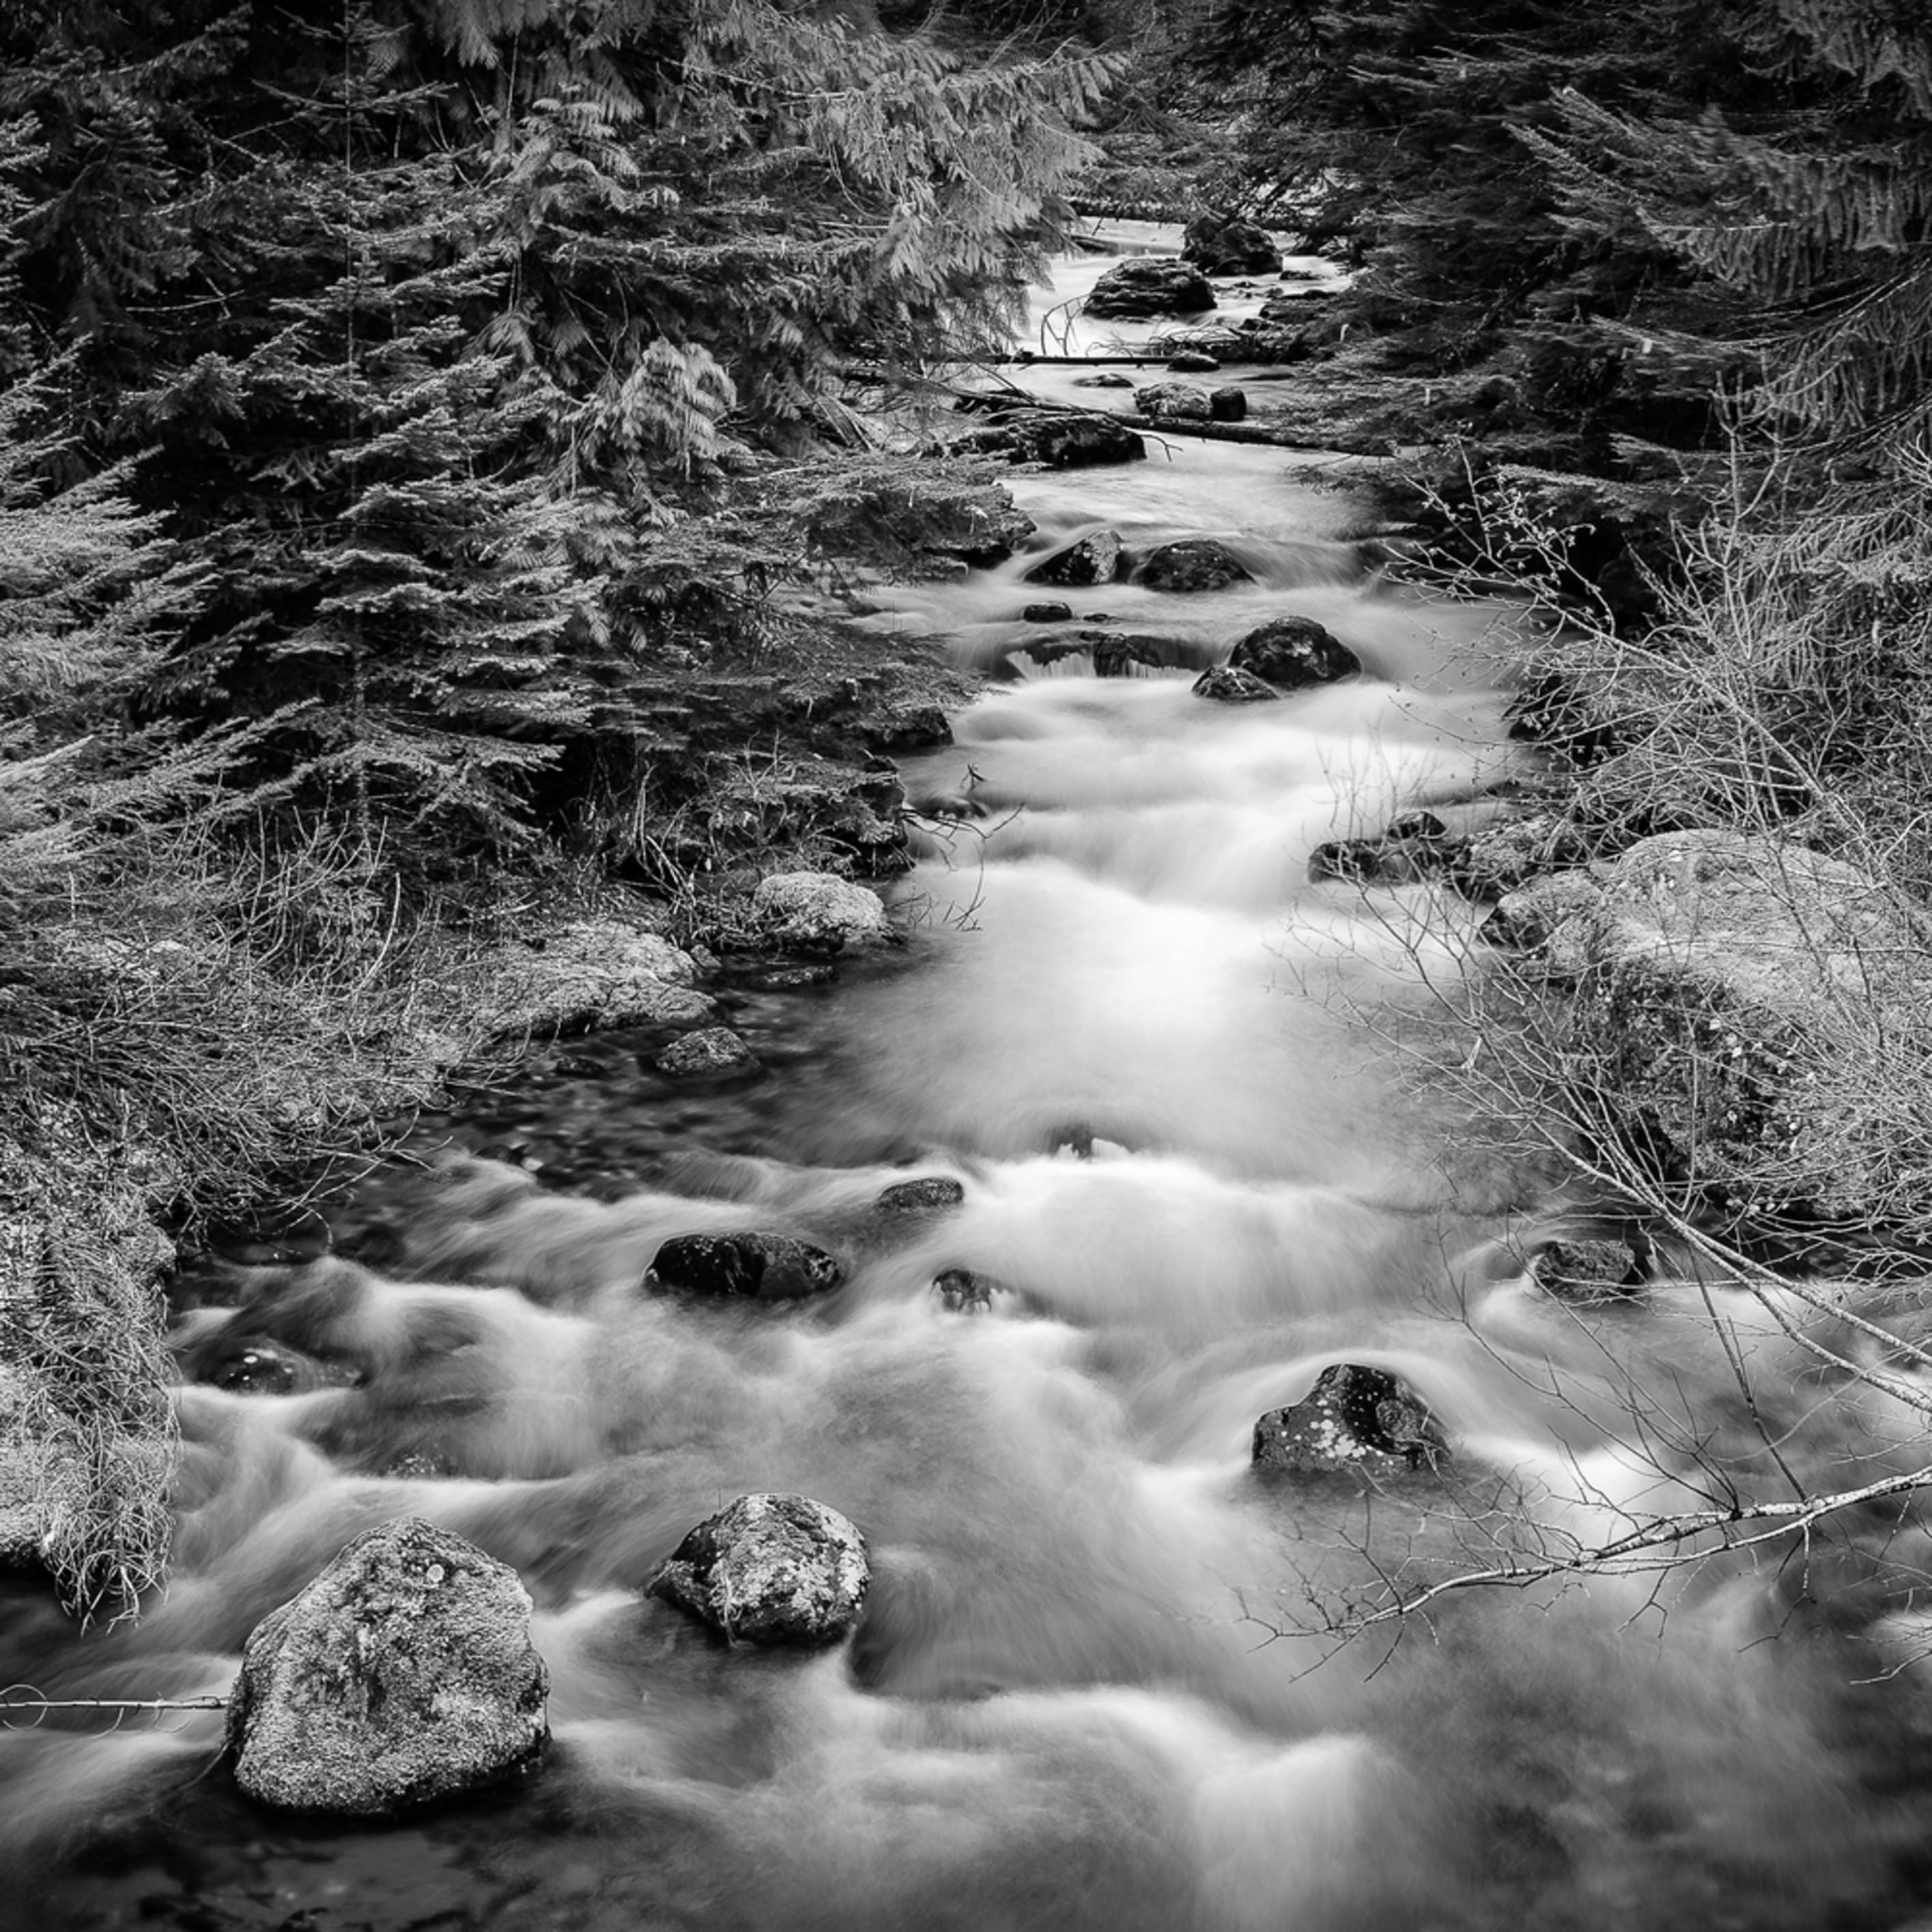 Huckleberry creek washington 2014 d8dv7c